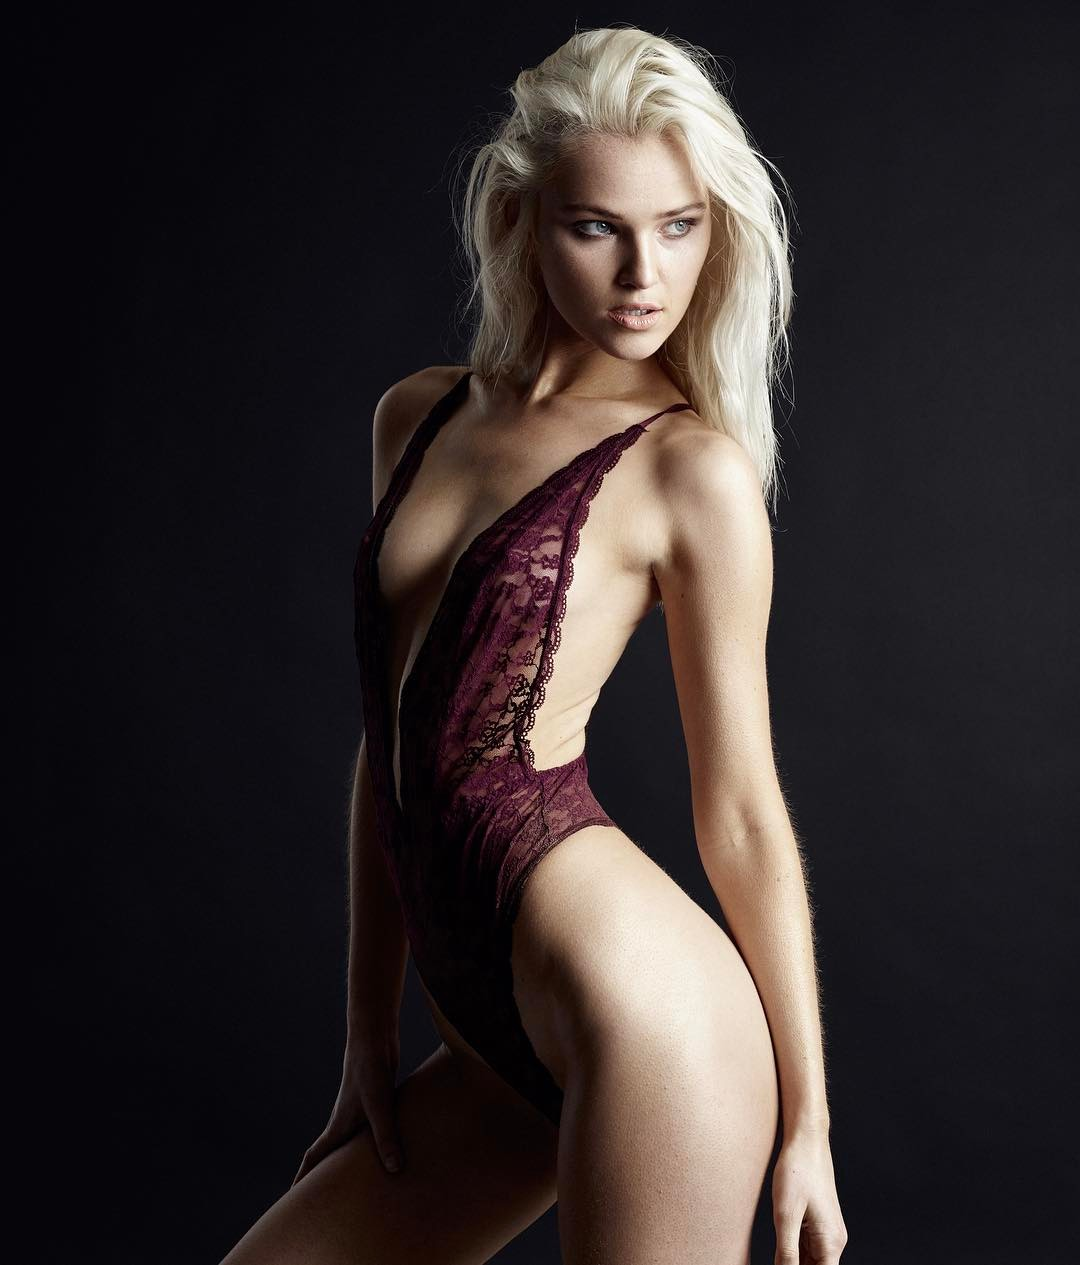 Bikini Alexa Reynen nudes (46 photos), Pussy